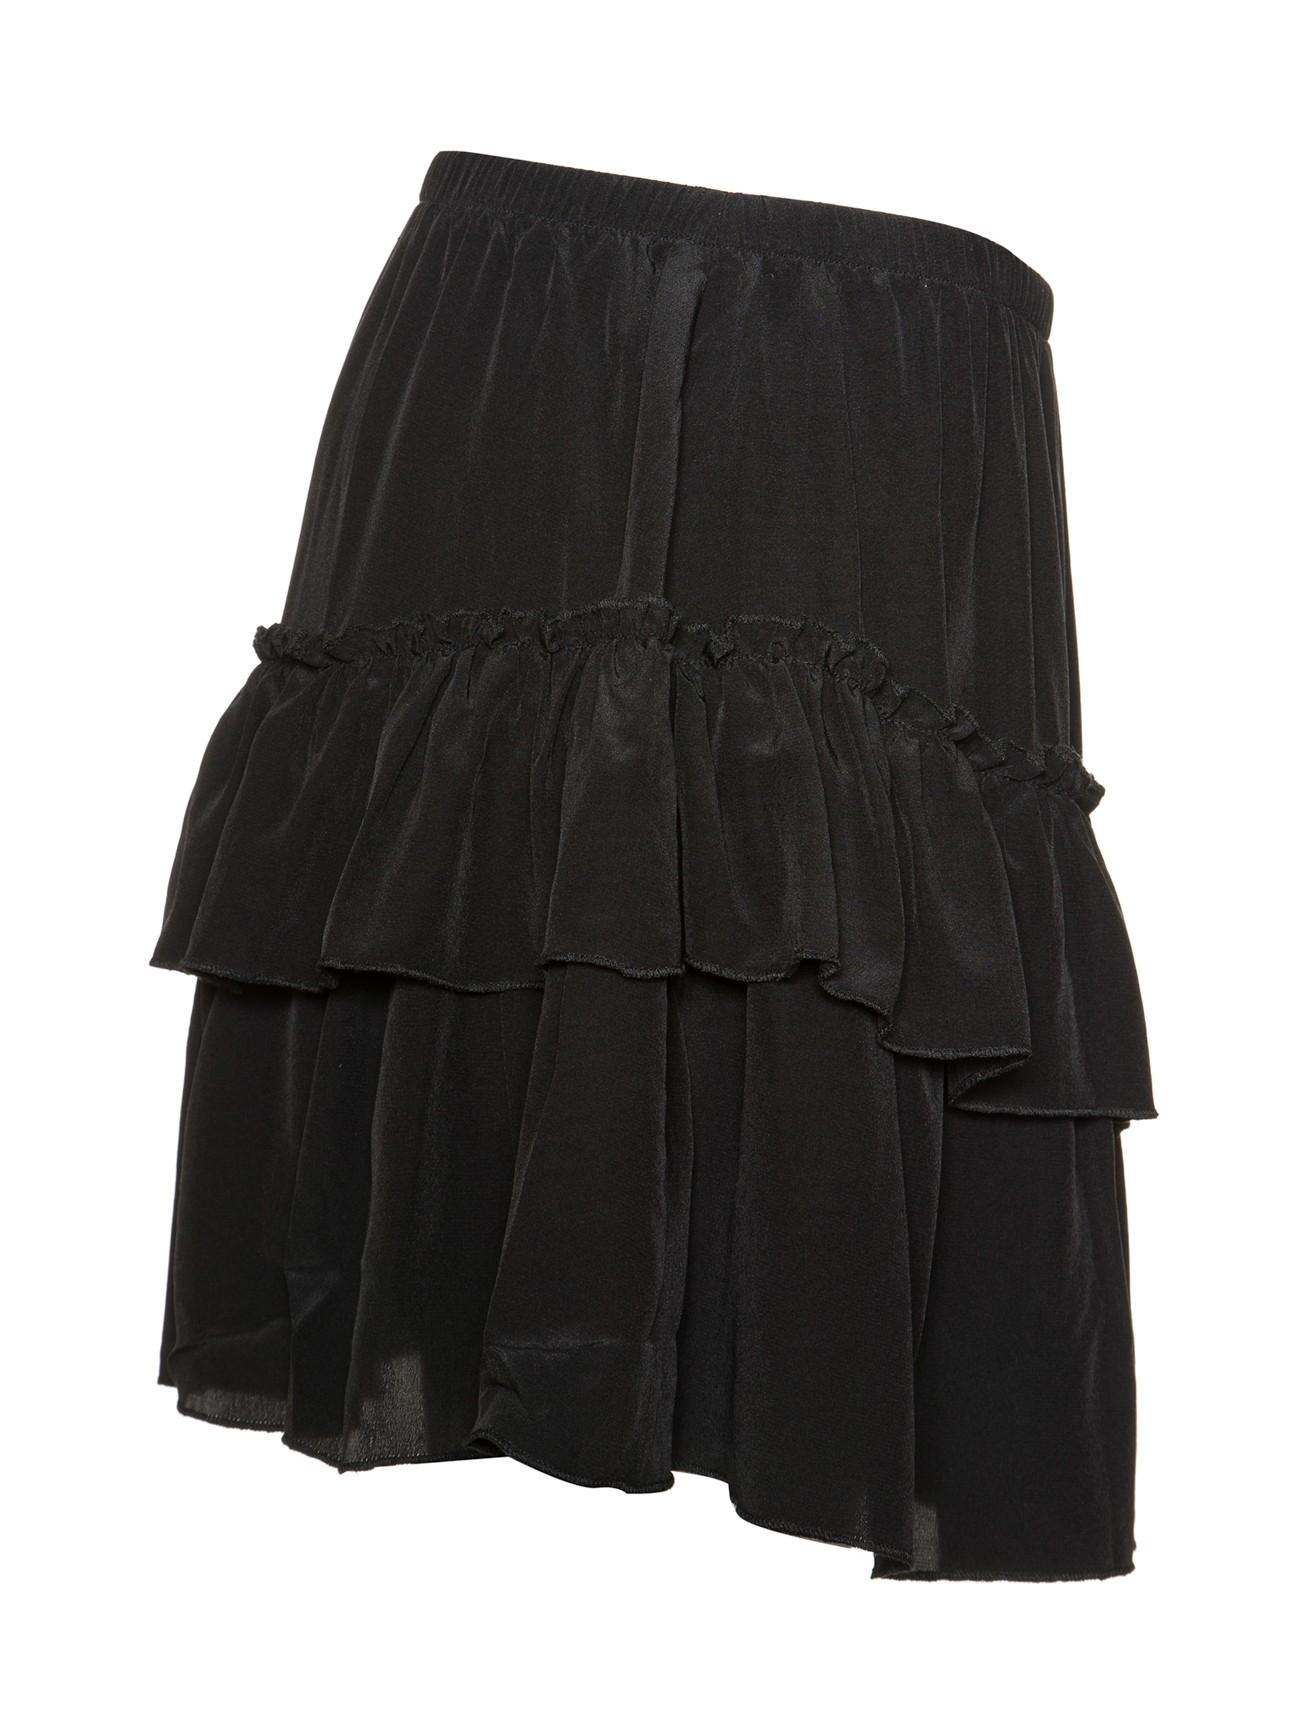 Silk ruffle skirt finish